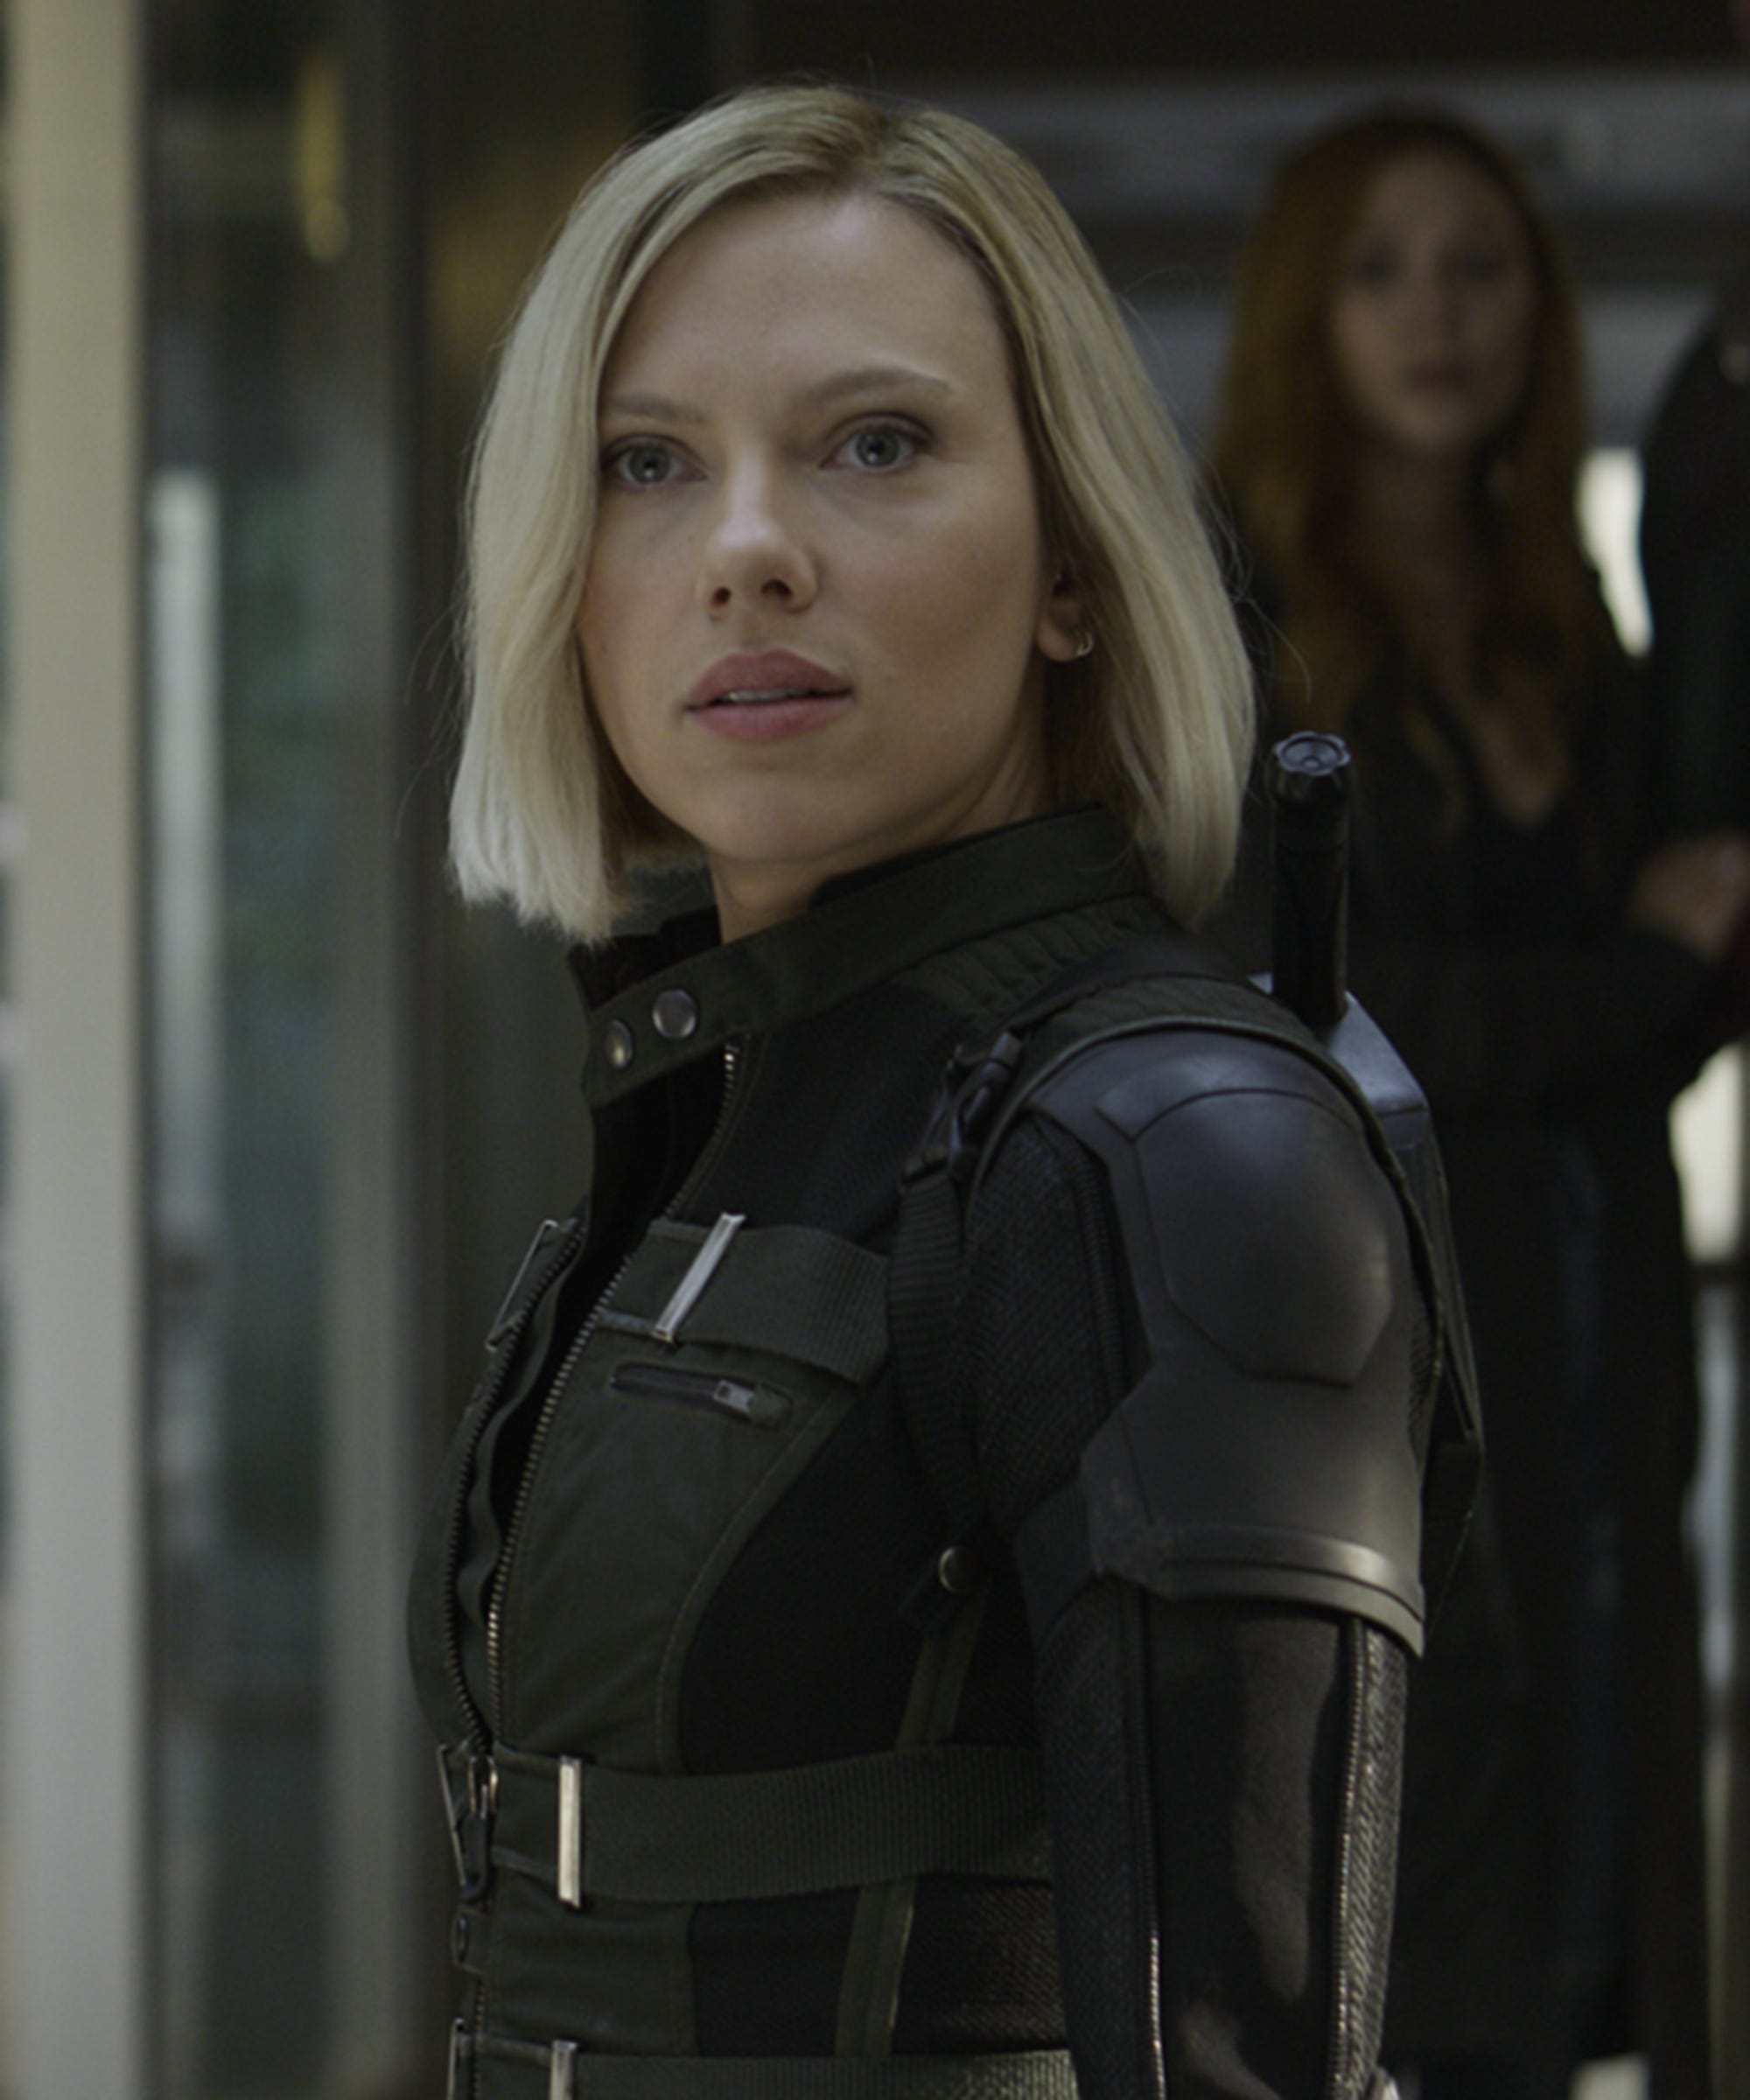 Black Widow Red Hair Color Teases Avengers Endgame Plot